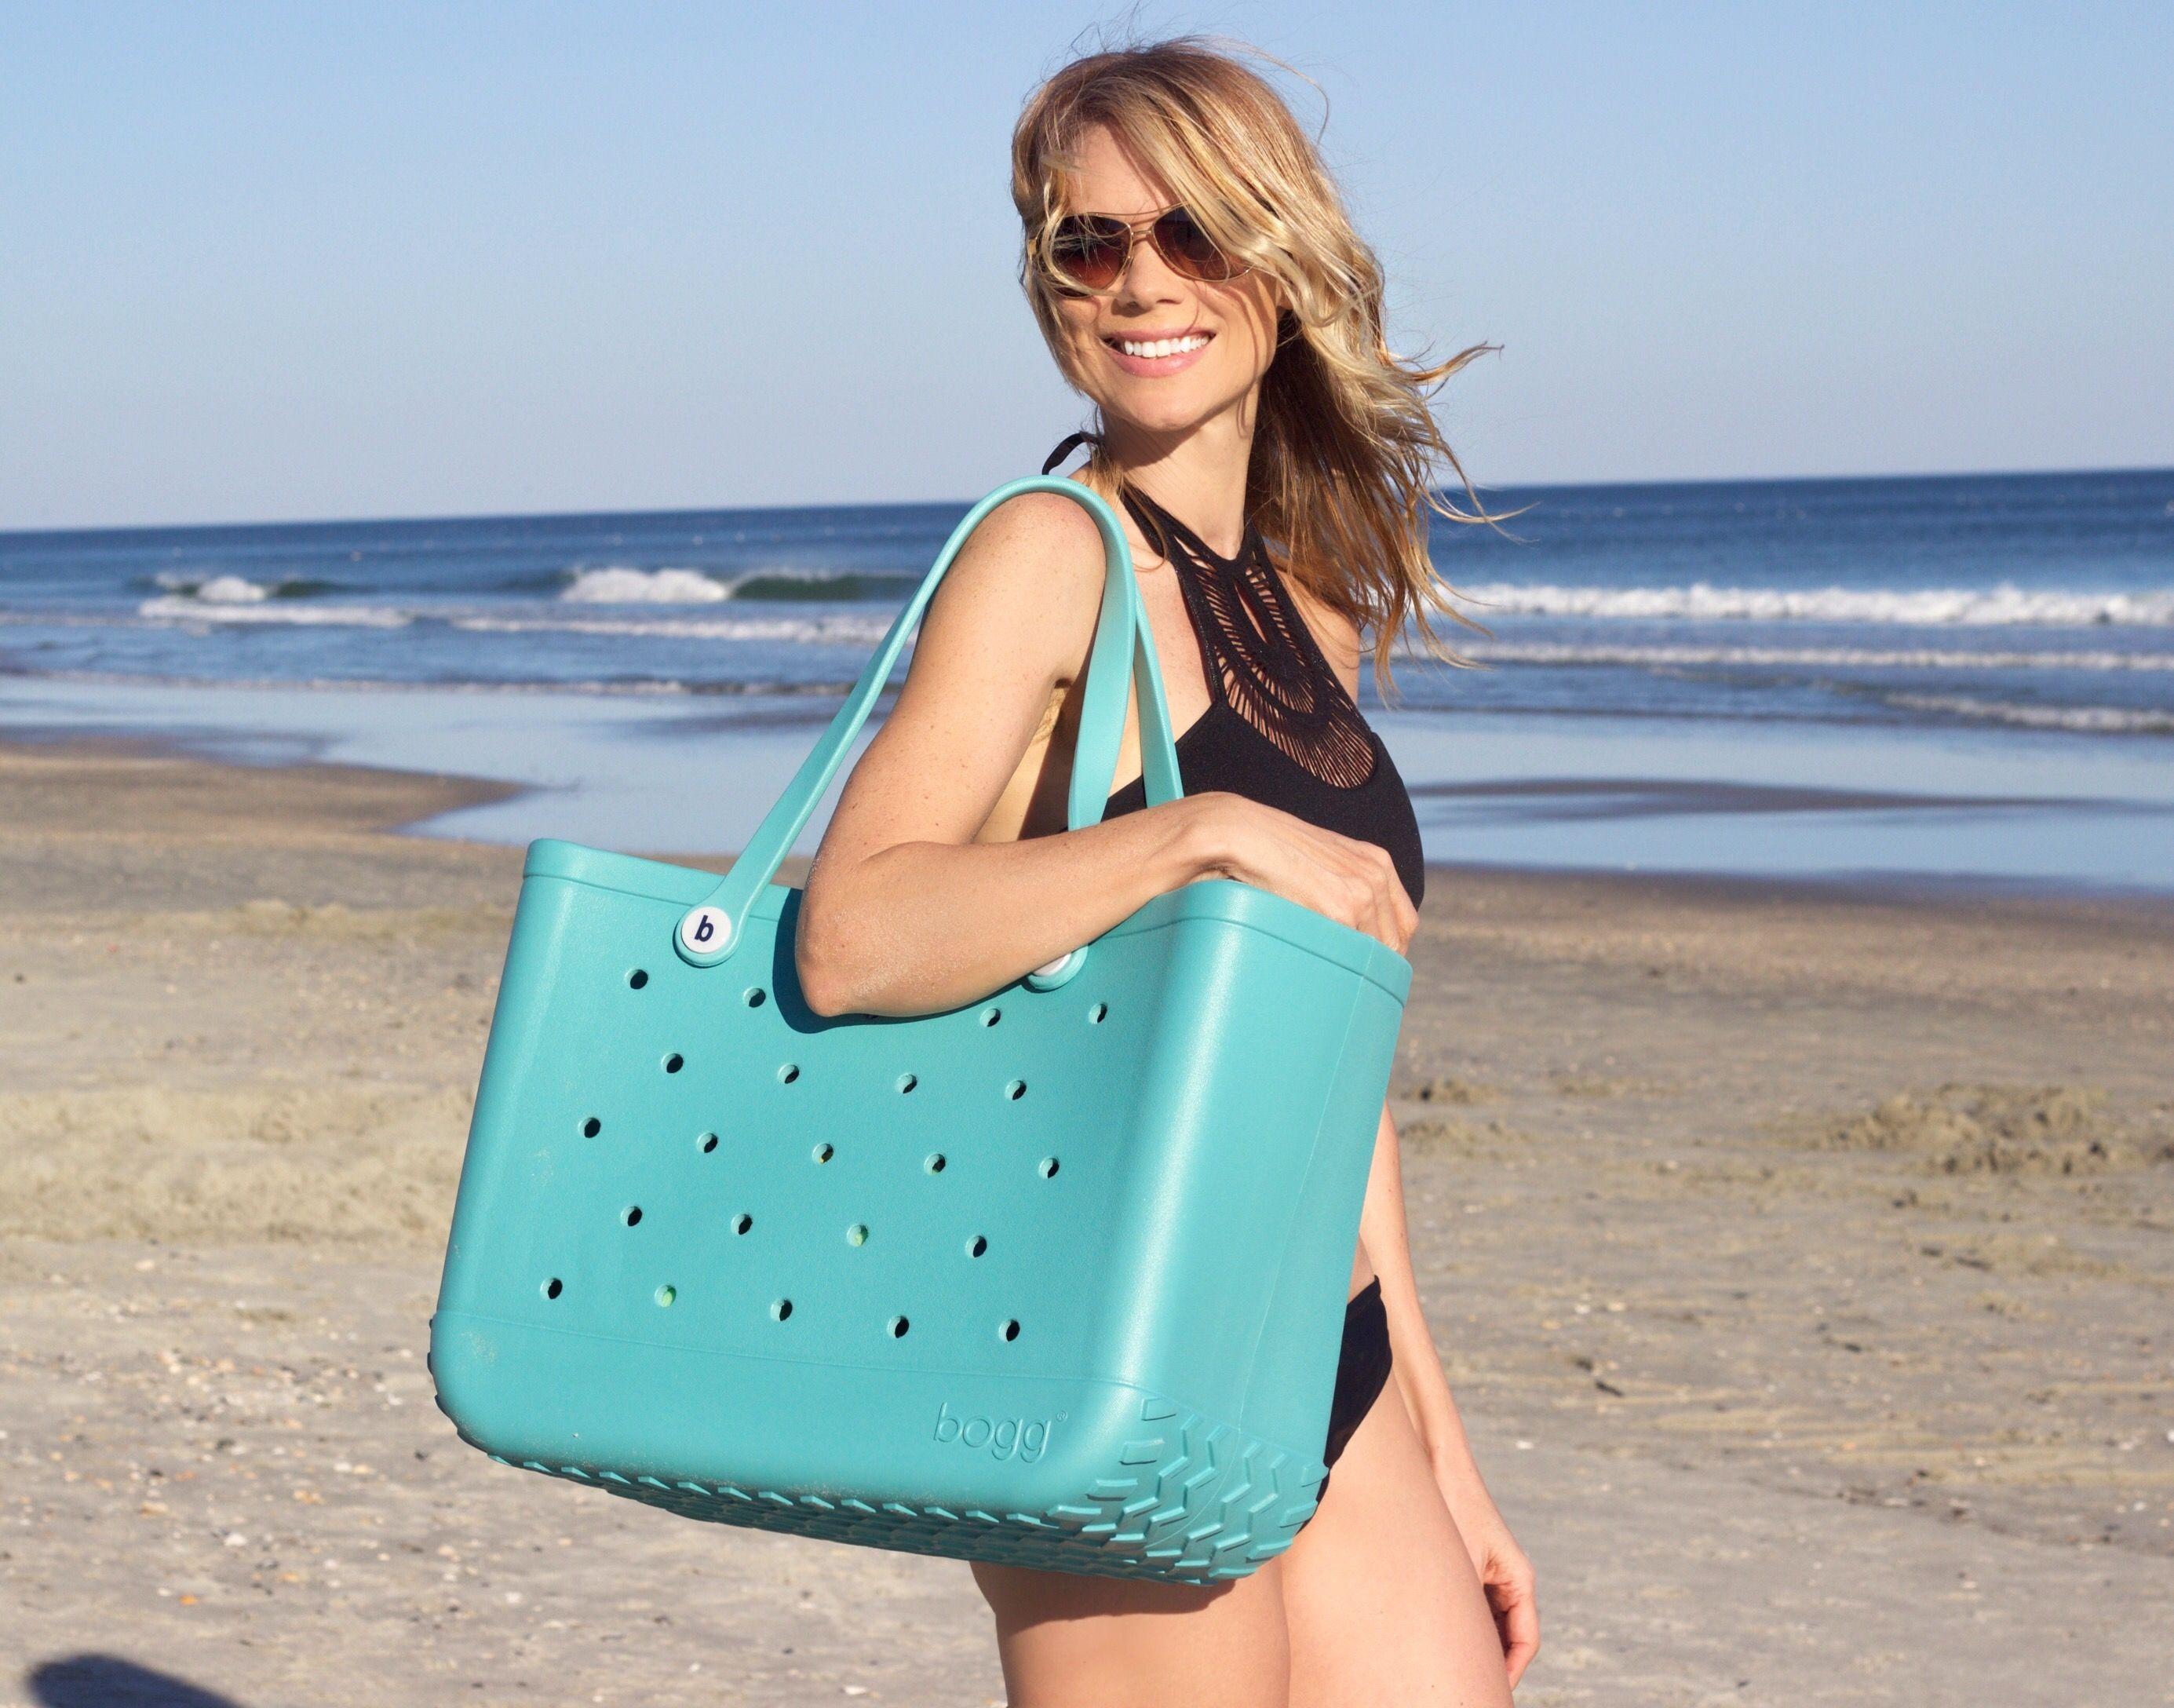 Best.Beach.Bag.Ever #boggbag #turquoise #totebag #bestbeachbagever ...